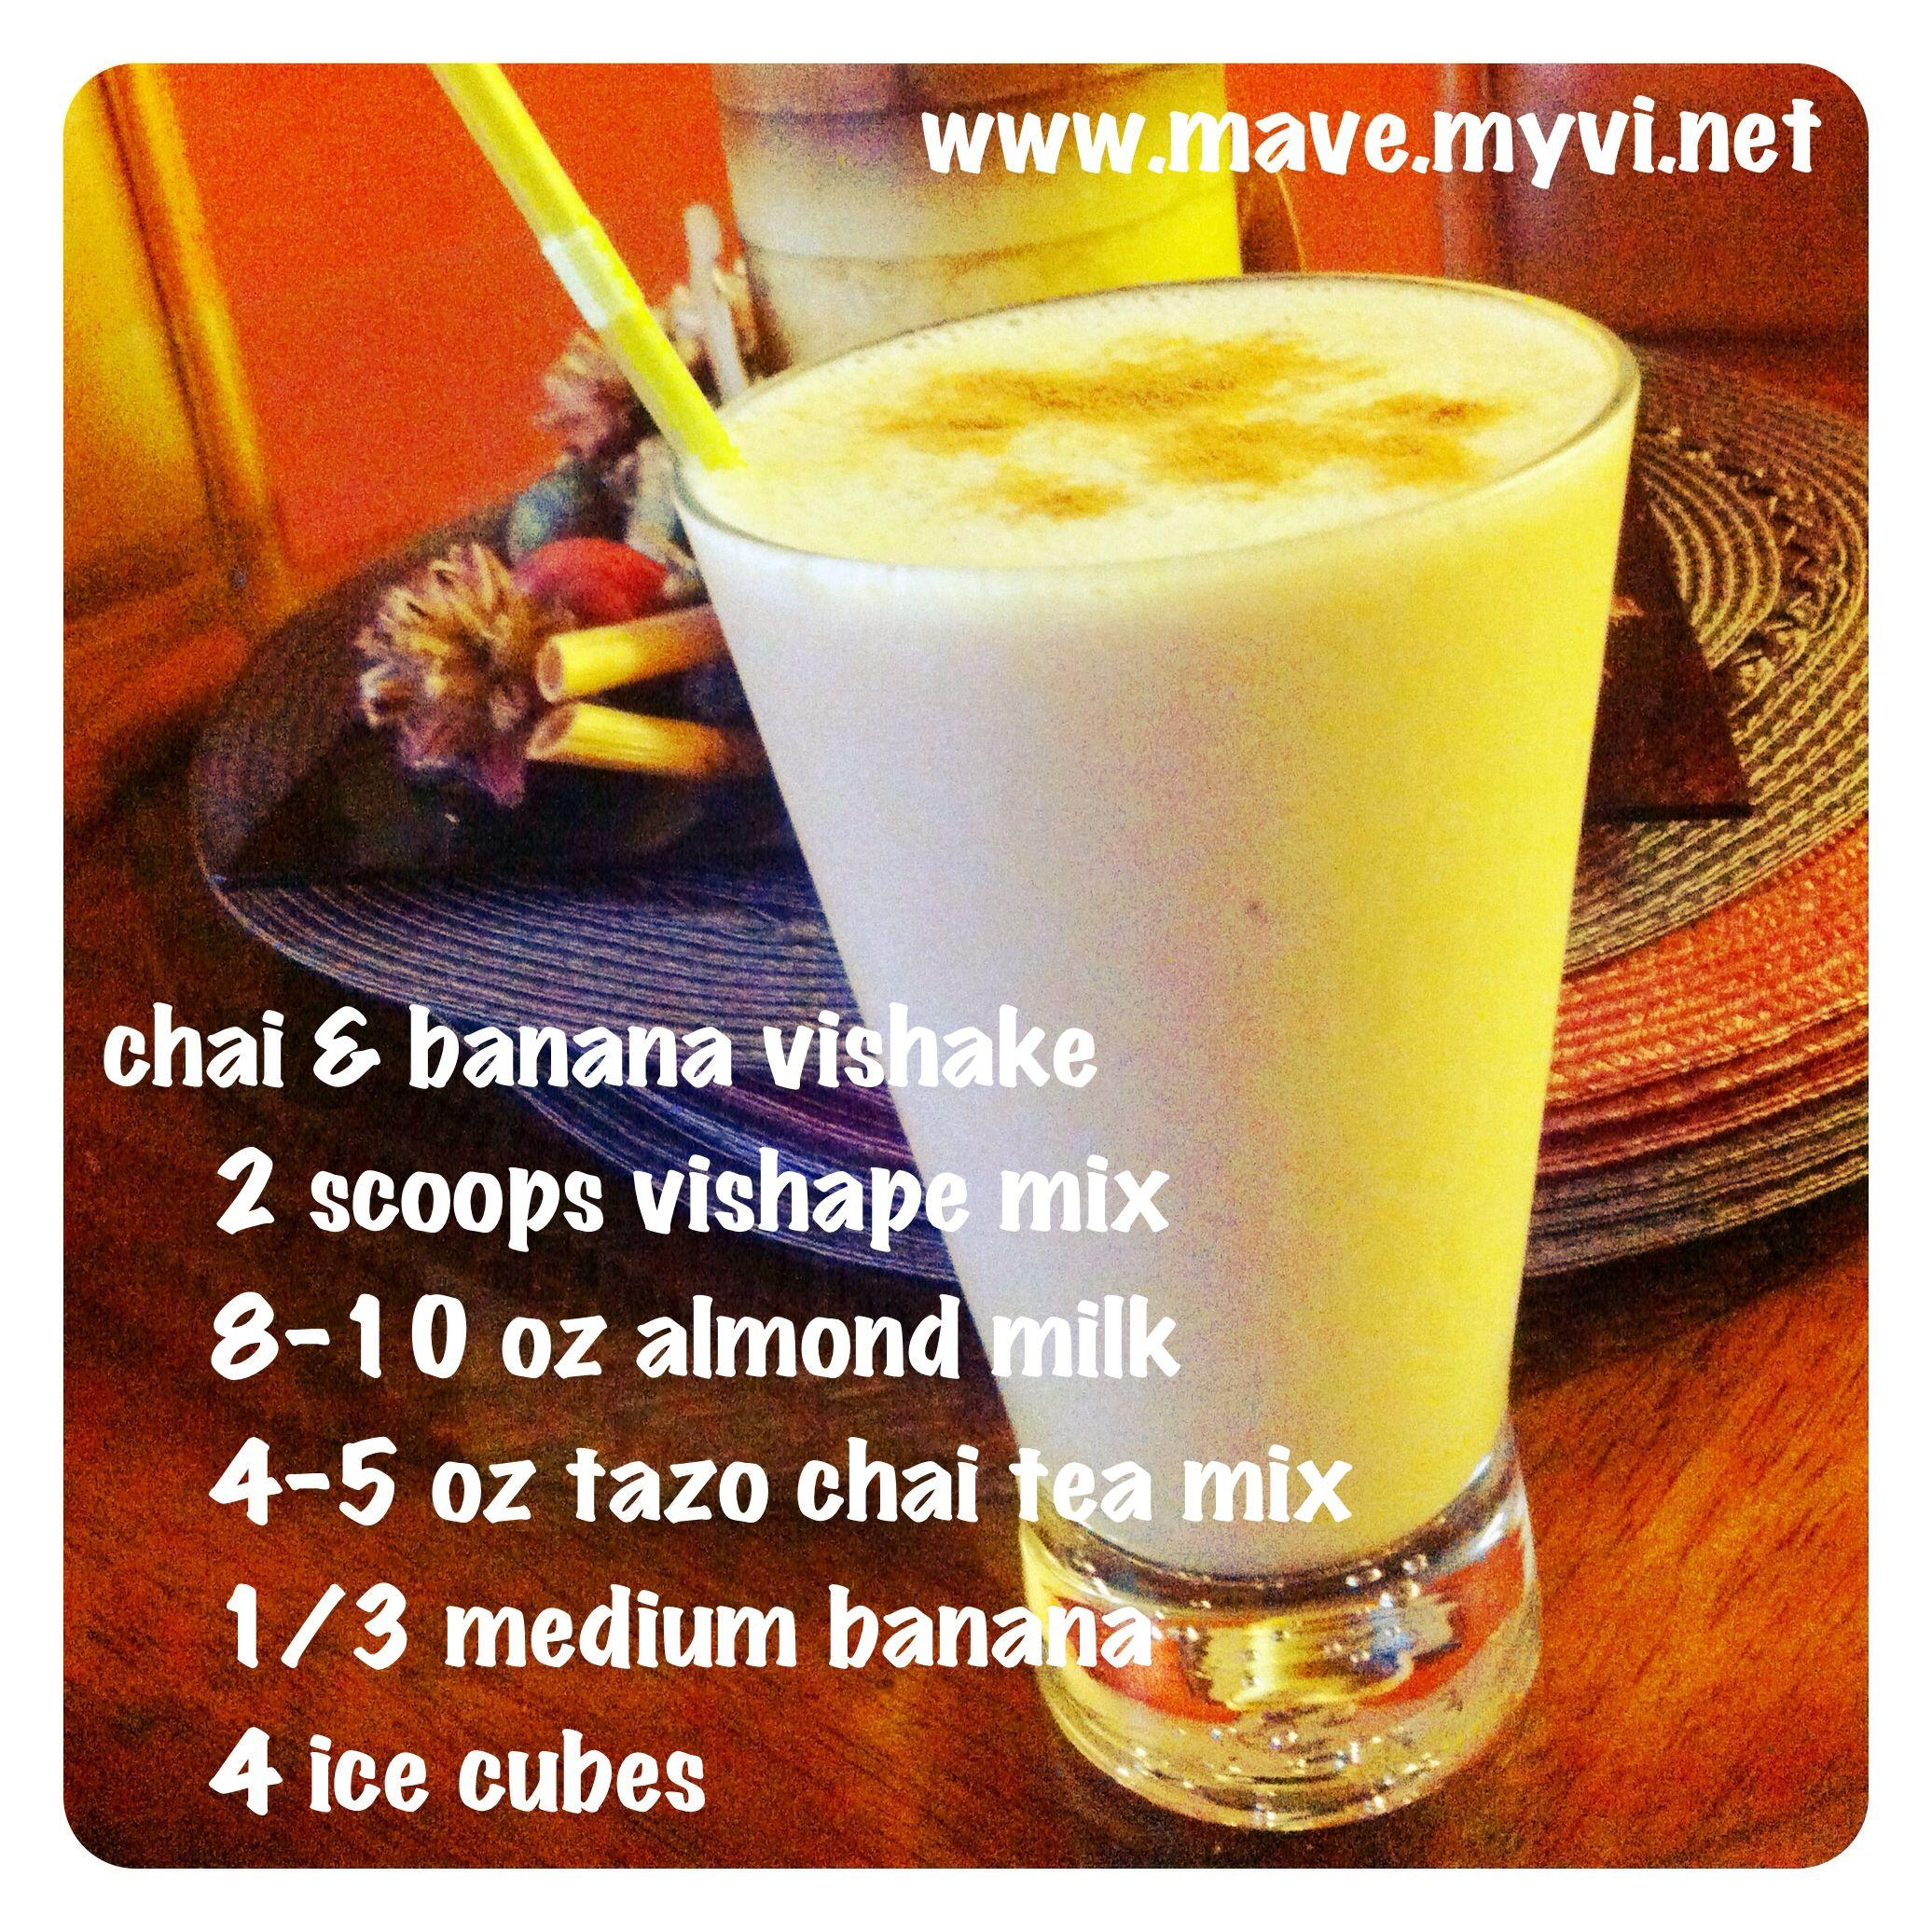 the chai & banana vishake is so yummy! makes for a great